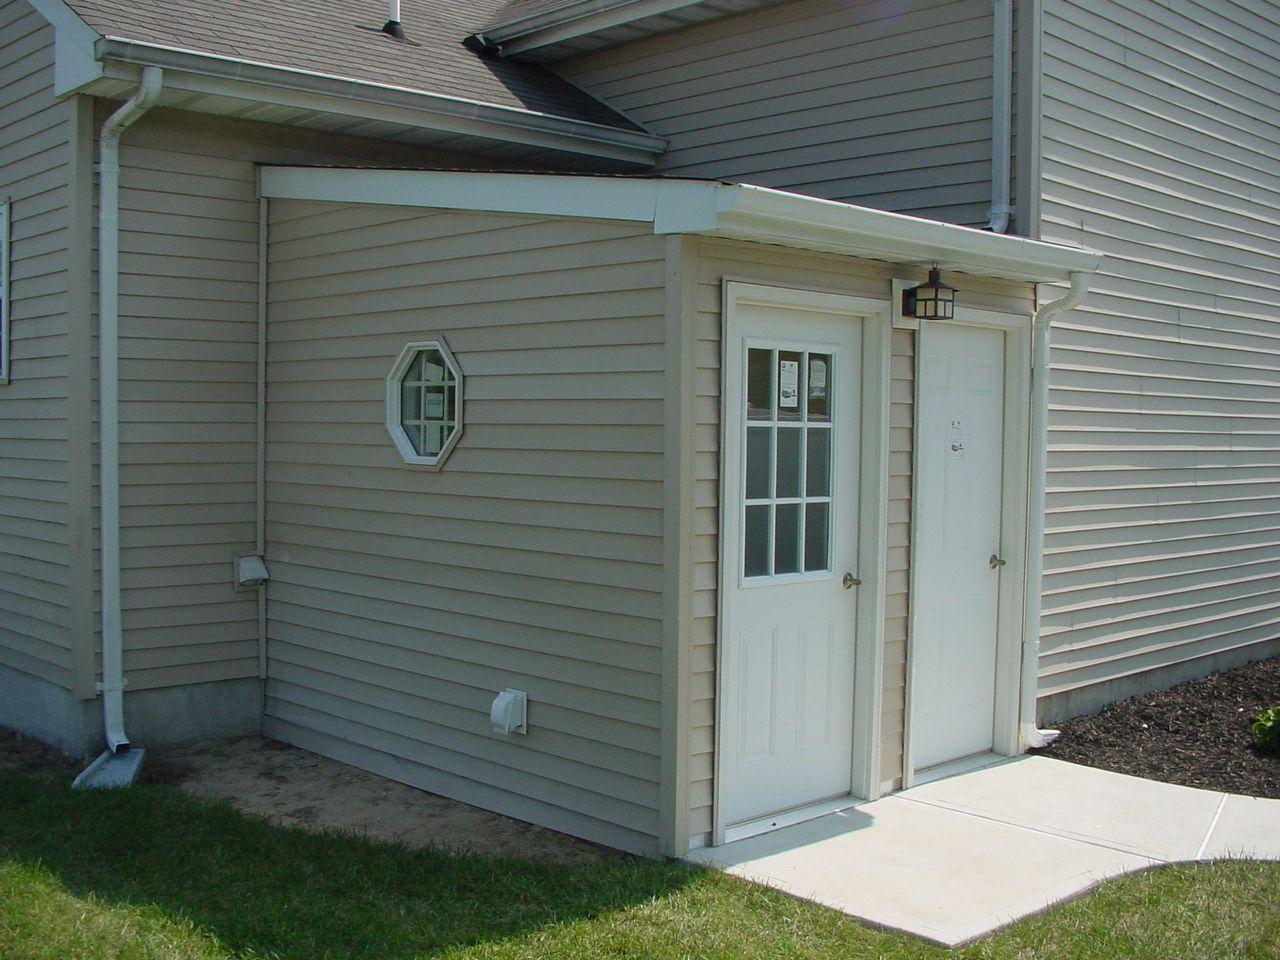 Basement Egress Door Basement Entrance Basement Doors Basement | Bilco Precast Basement Stairs | Egress Window | Basement Entry | Precast Concrete Steps | Bilco Doors | Wine Cellar